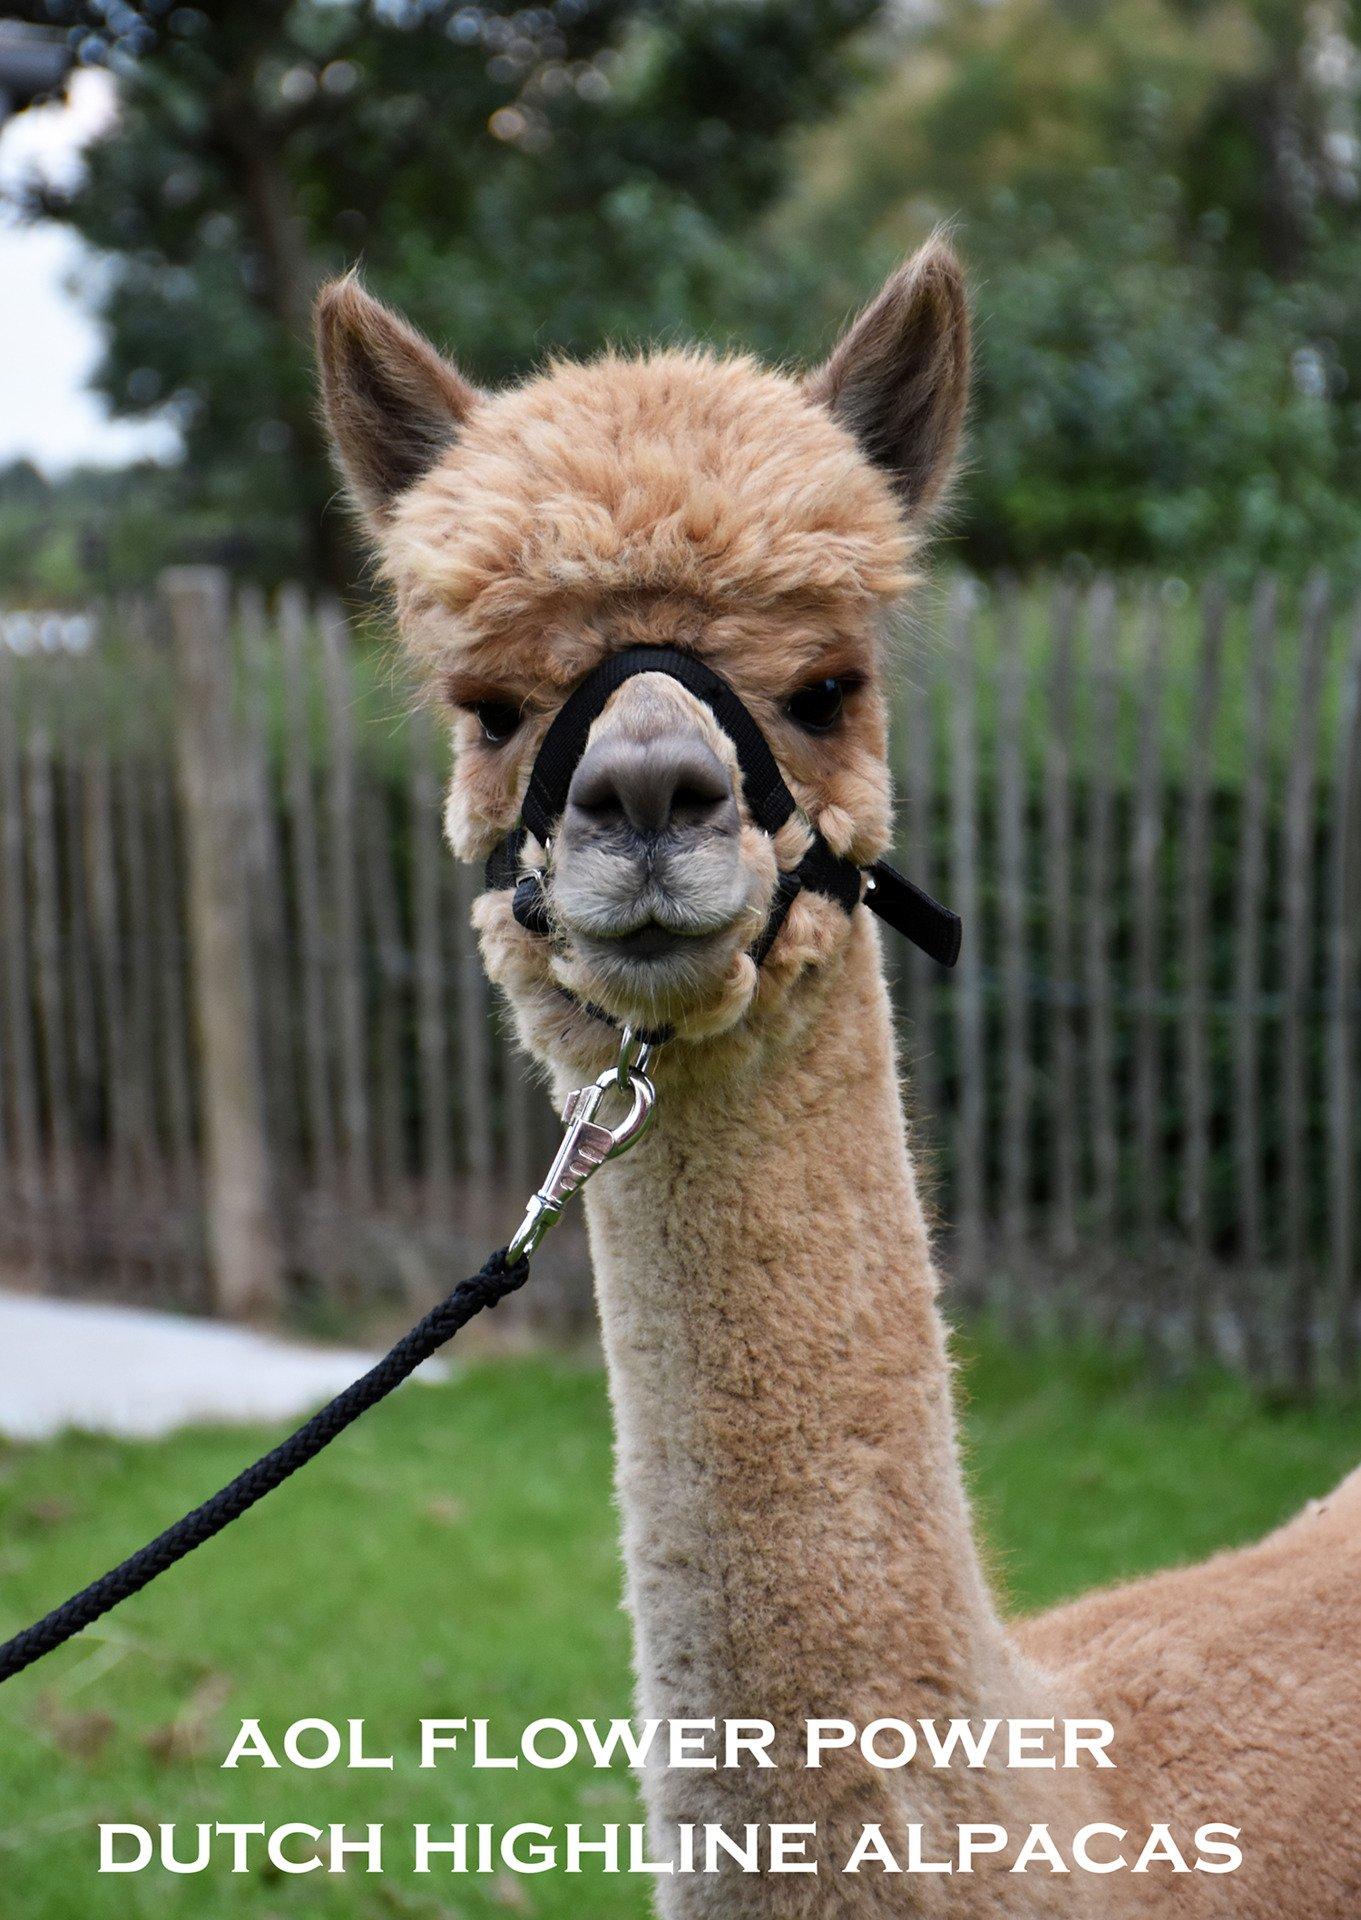 AOL FLOWER POWER — aangeboden door Dutch Highline Alpacas